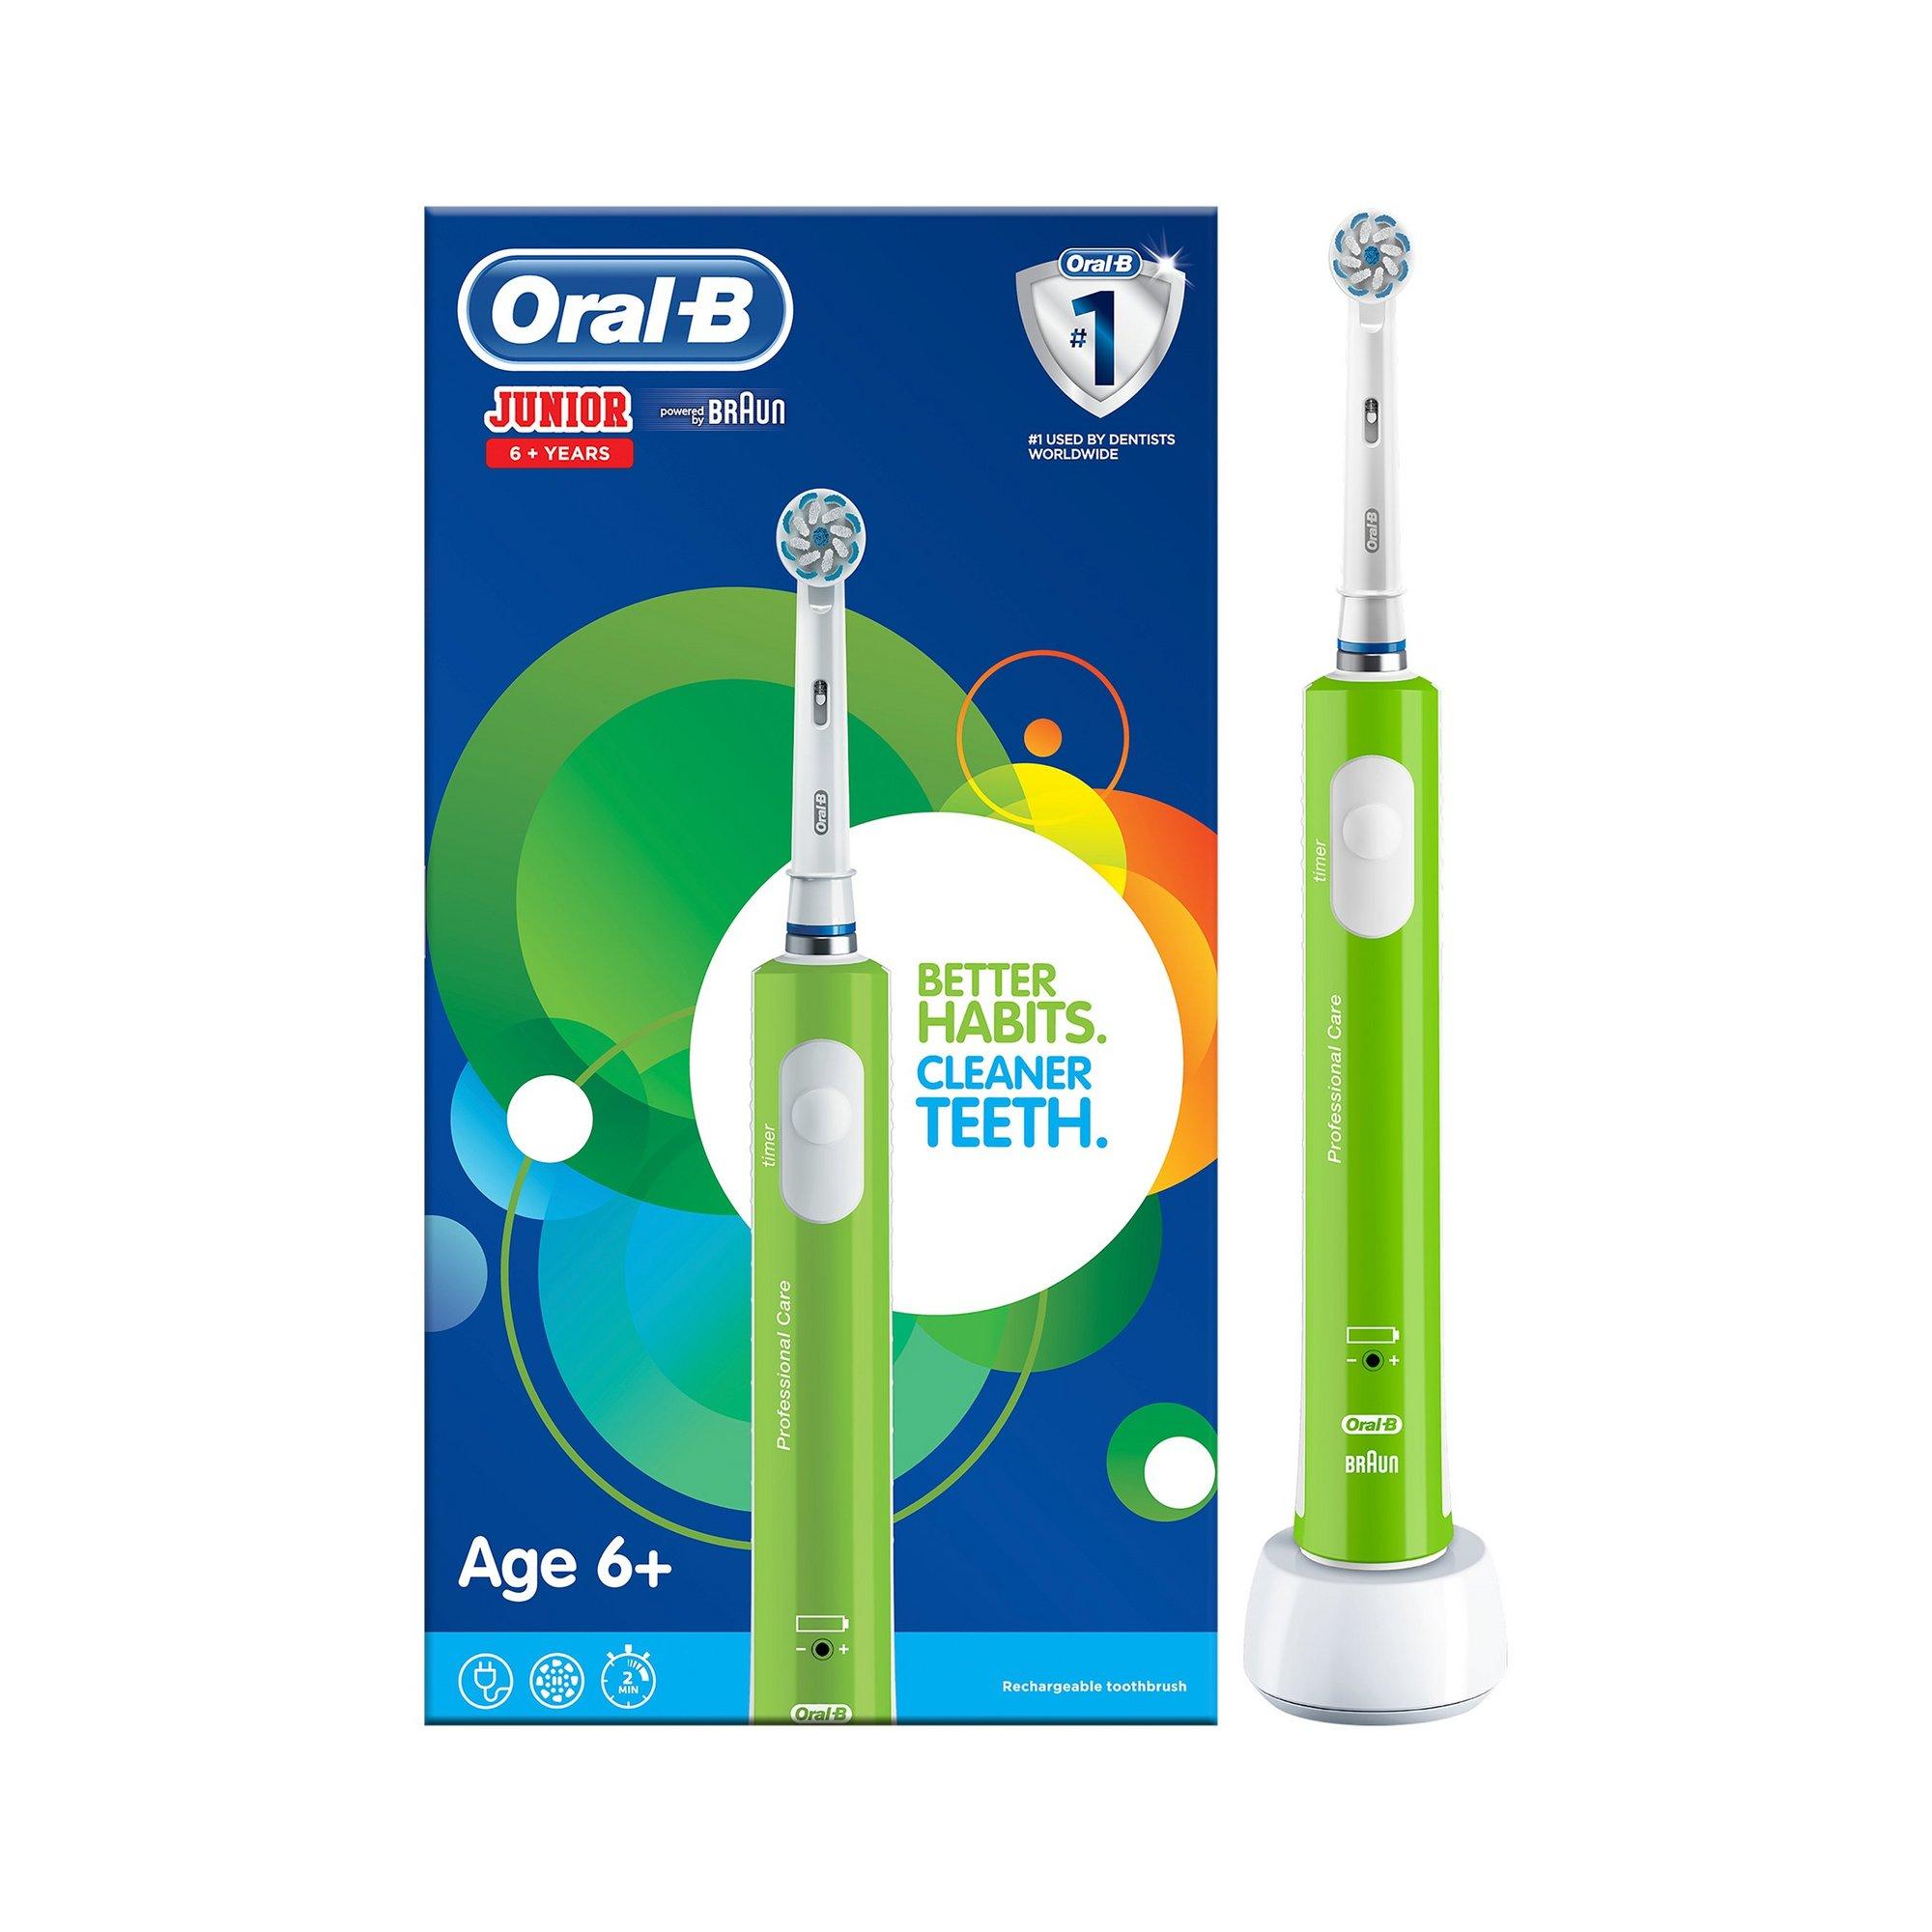 Image of Oral B Junior Toothbrush